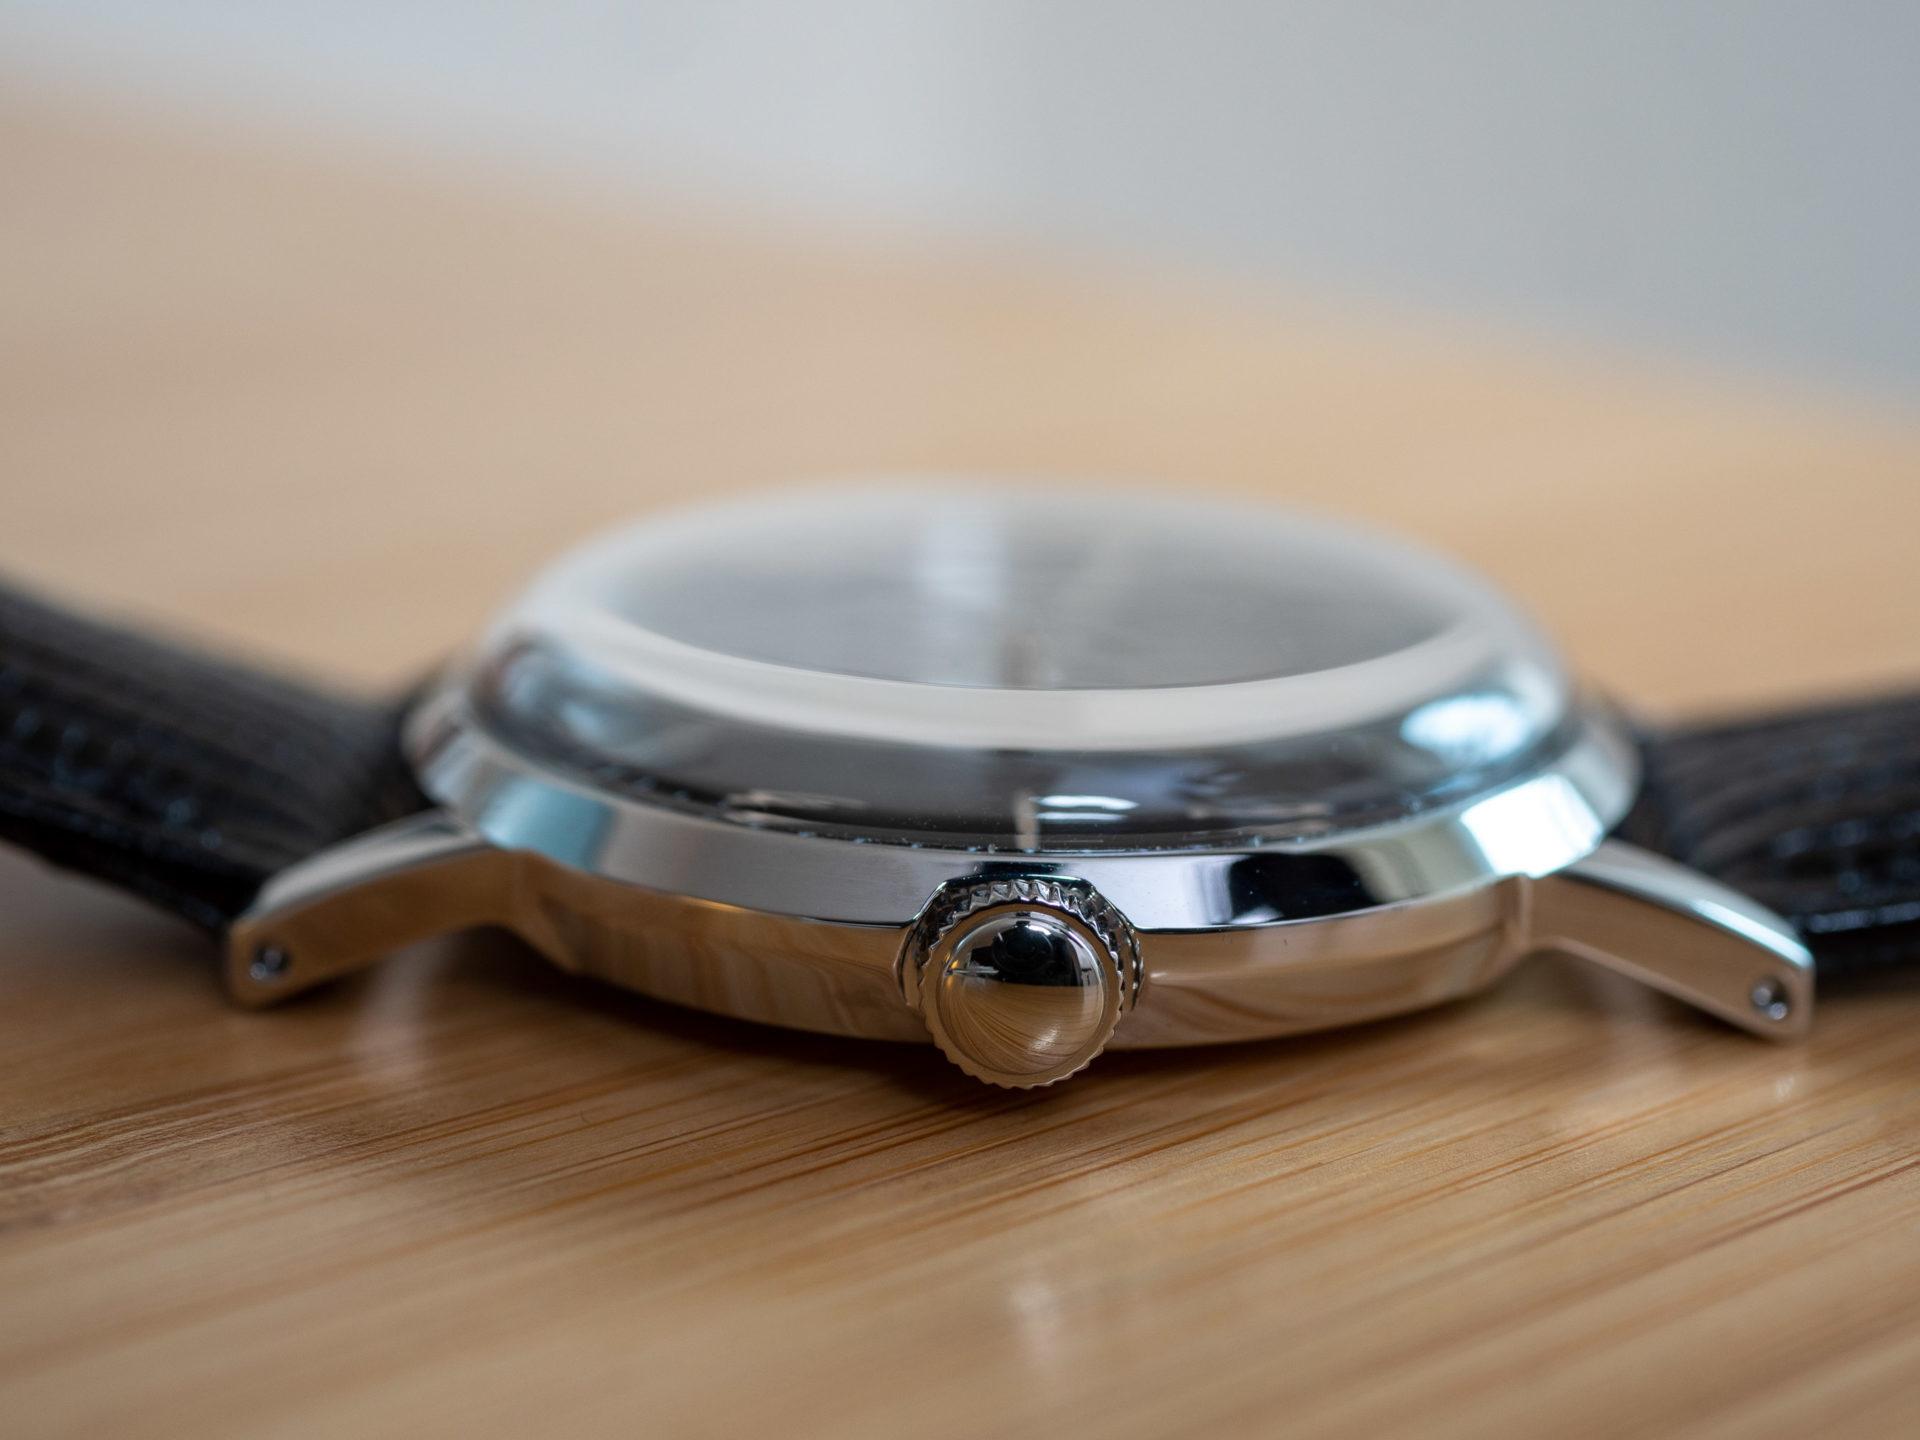 Timex Marlin 34 crown